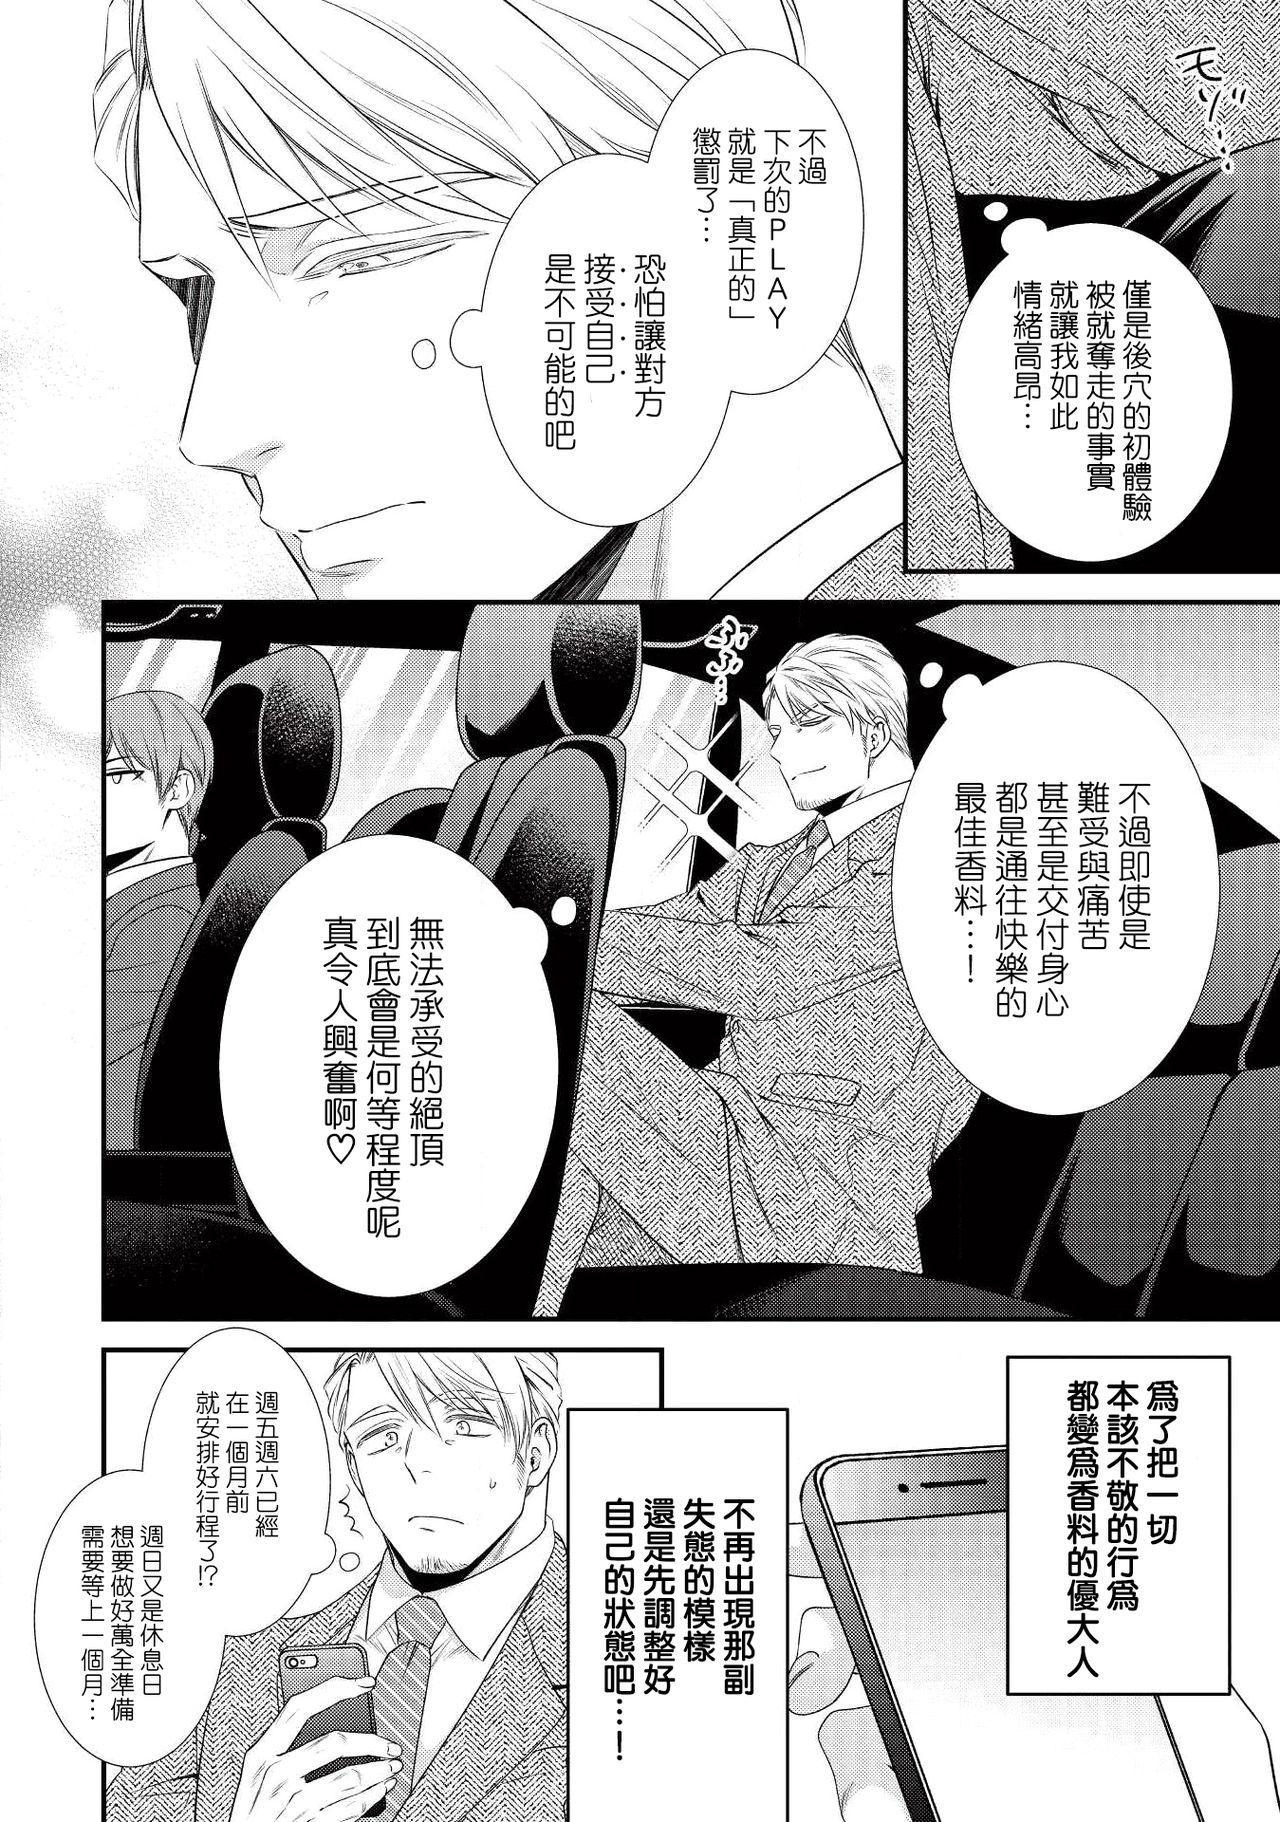 [Aion Kiu] Ijimete Kudasai Omega-sama ch.1-2 [Chinese] [沒有漢化] [Digital] 42